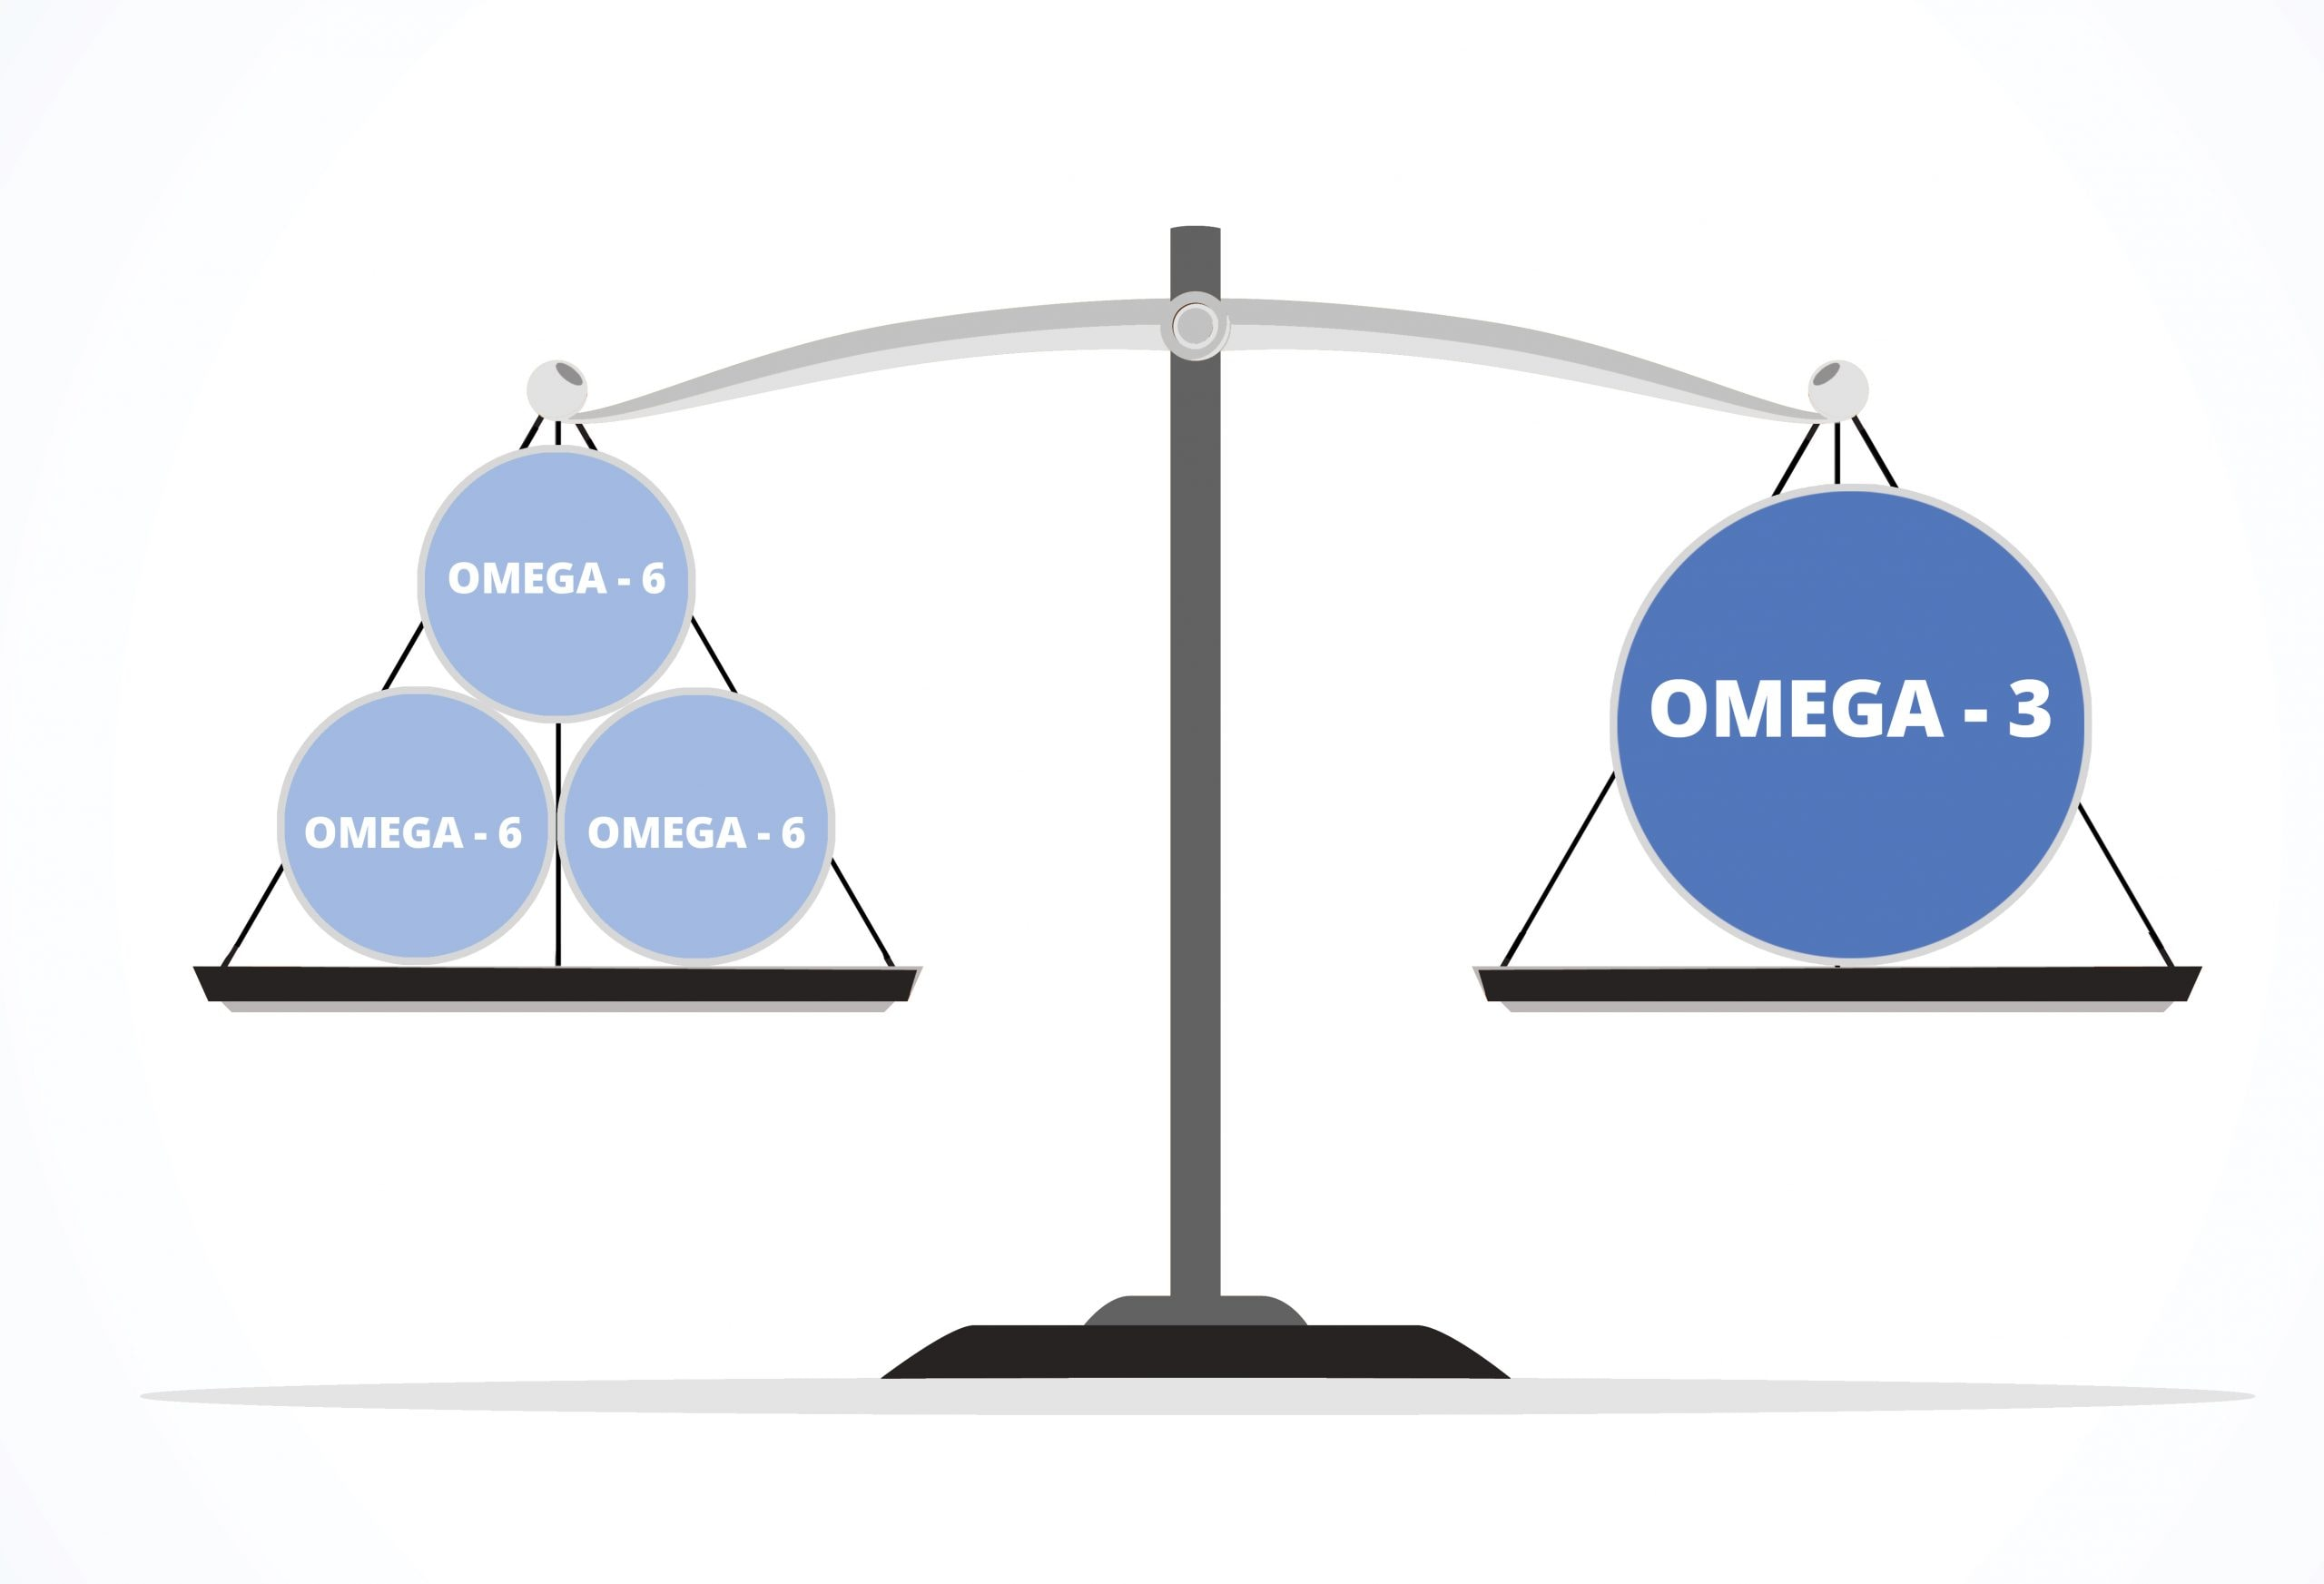 omega 6 vs omega 3